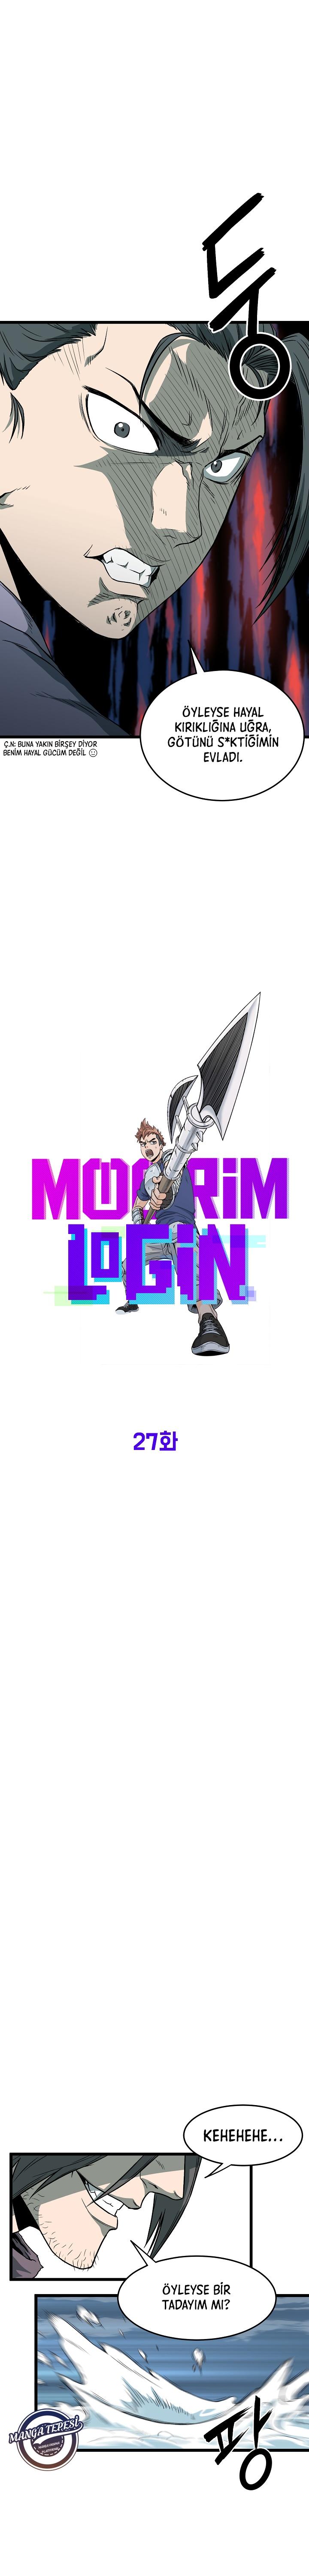 murim-loginbolum-27